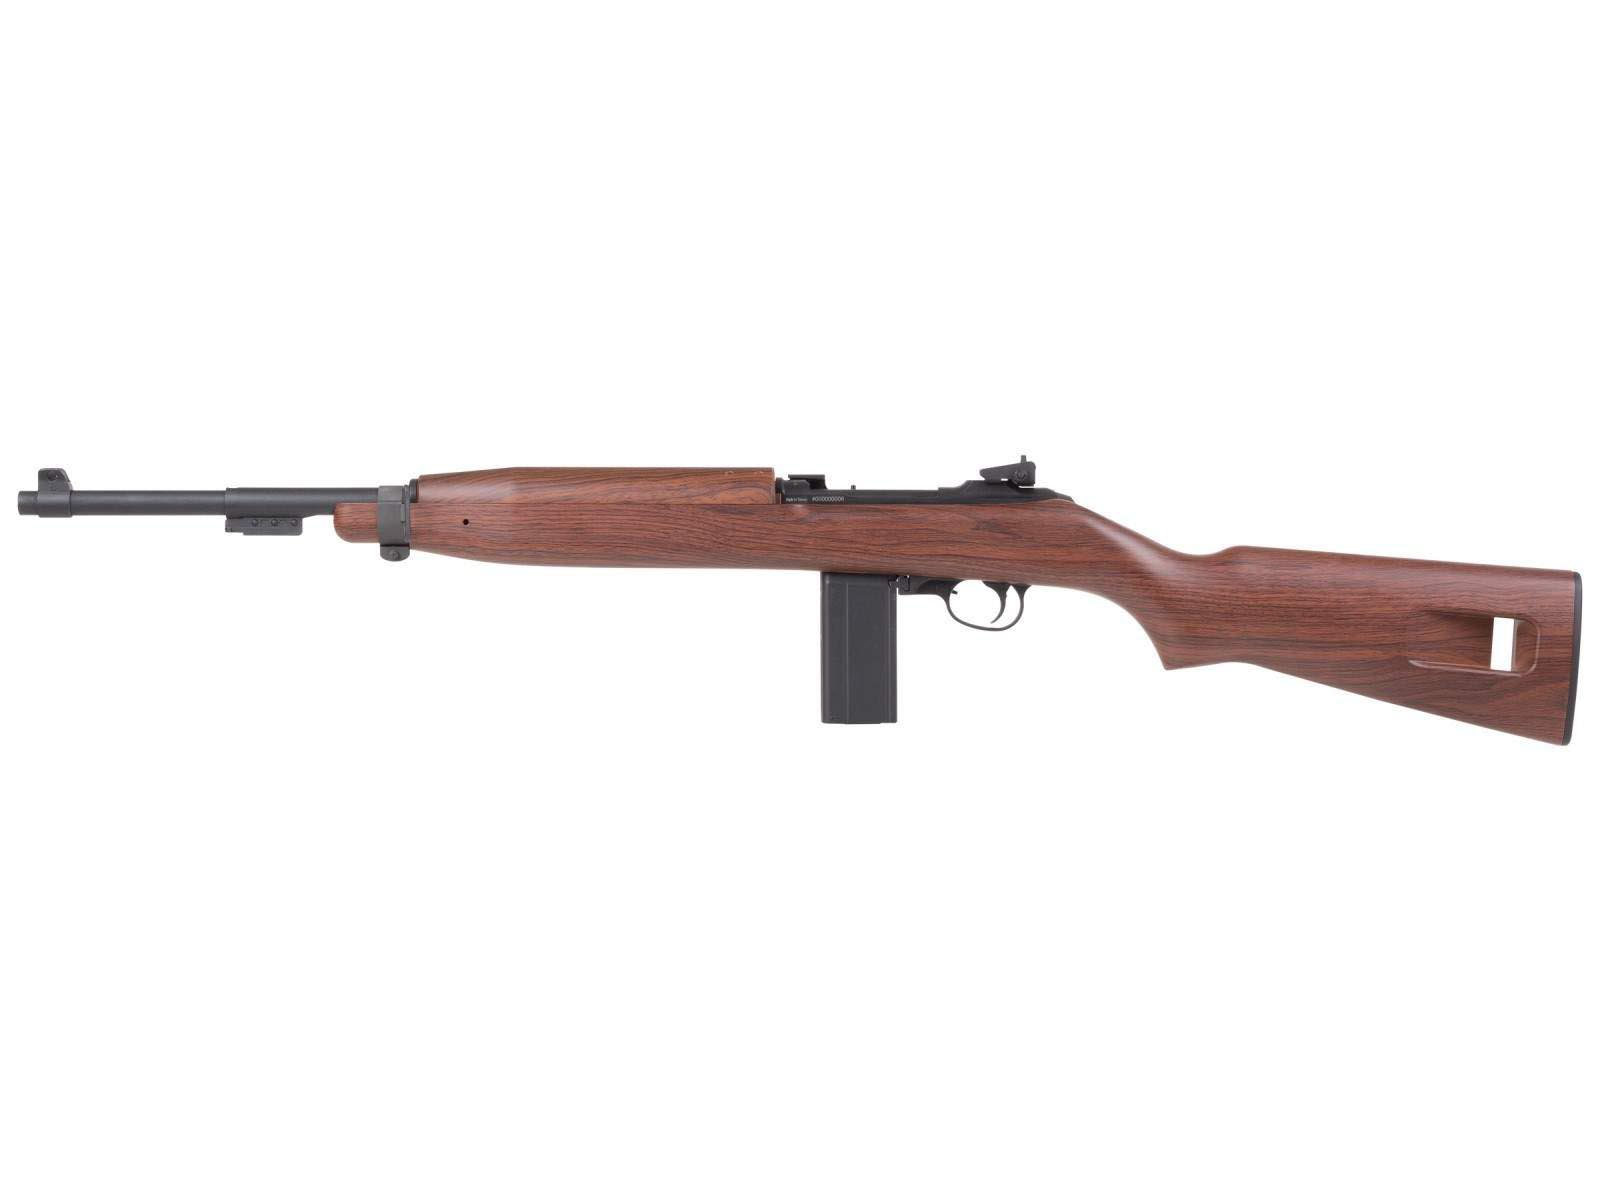 Springfield Armory M1 Carbine BB Rifle